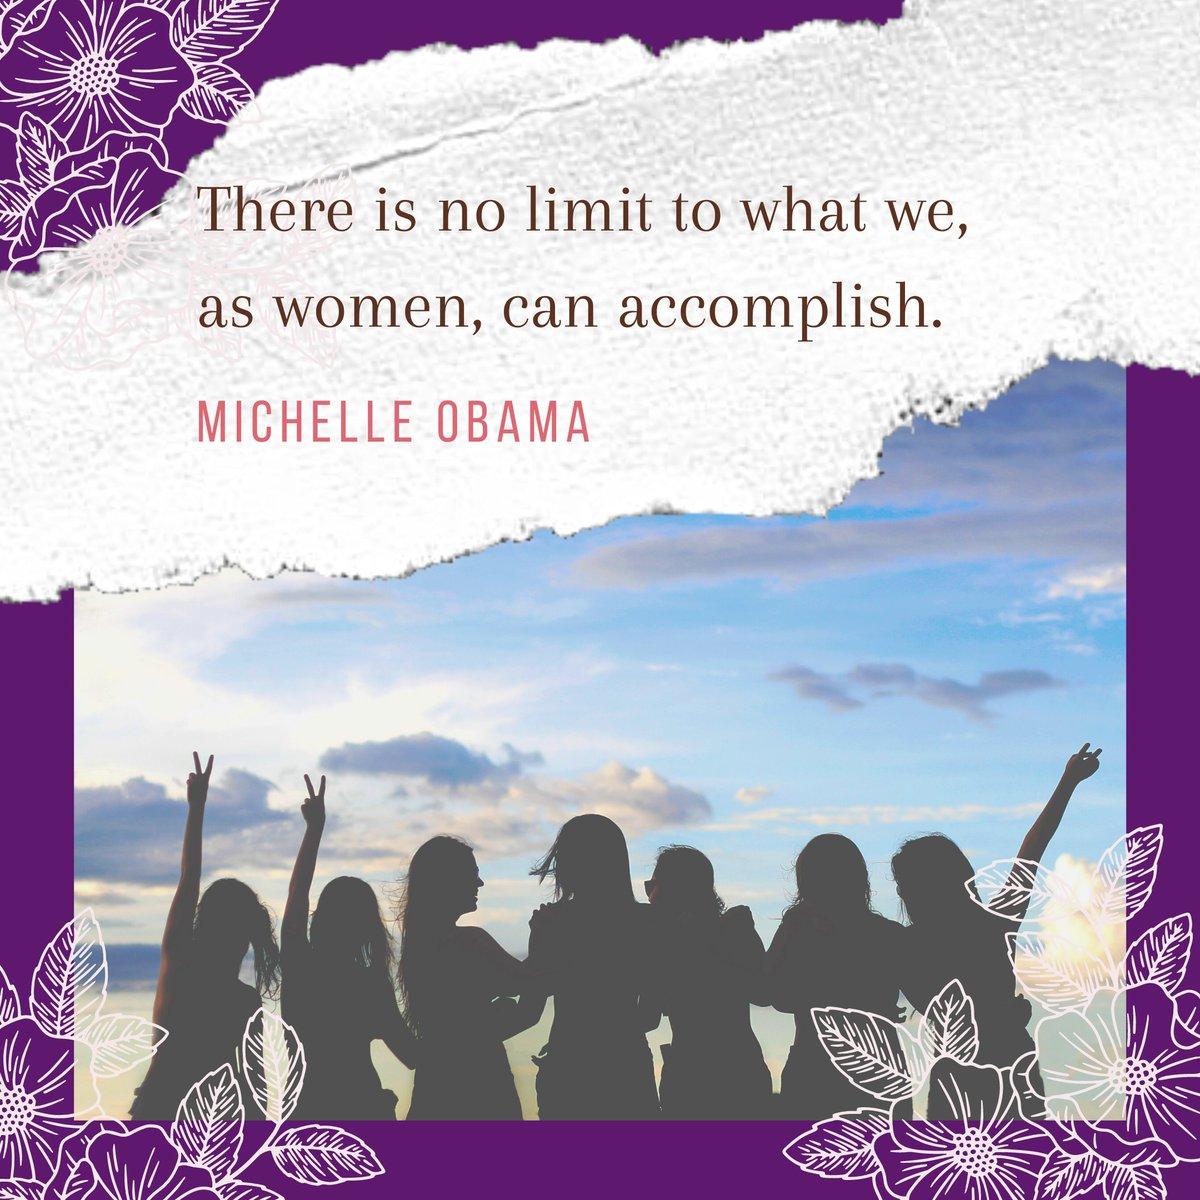 Celebrating International Women's Day! 💜💪 #InternationalWomensDay #internationalwomensday2021 #WomensDay #WomenSupportingWomen